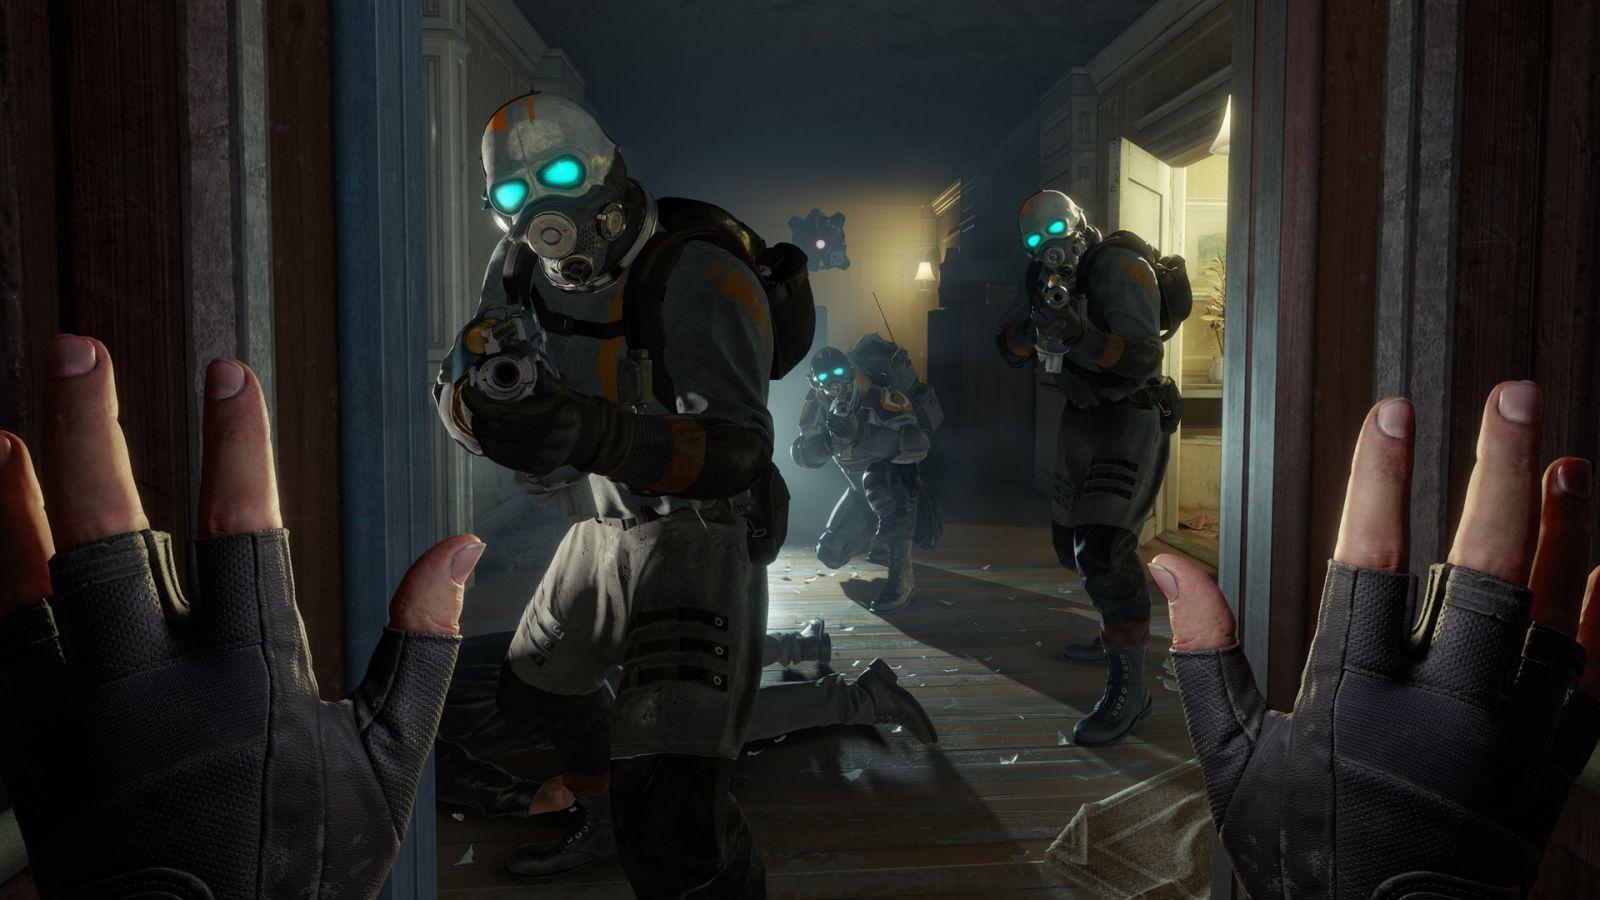 Half-Life: Alyx Steam Workshop открывает двери для модификаций ()